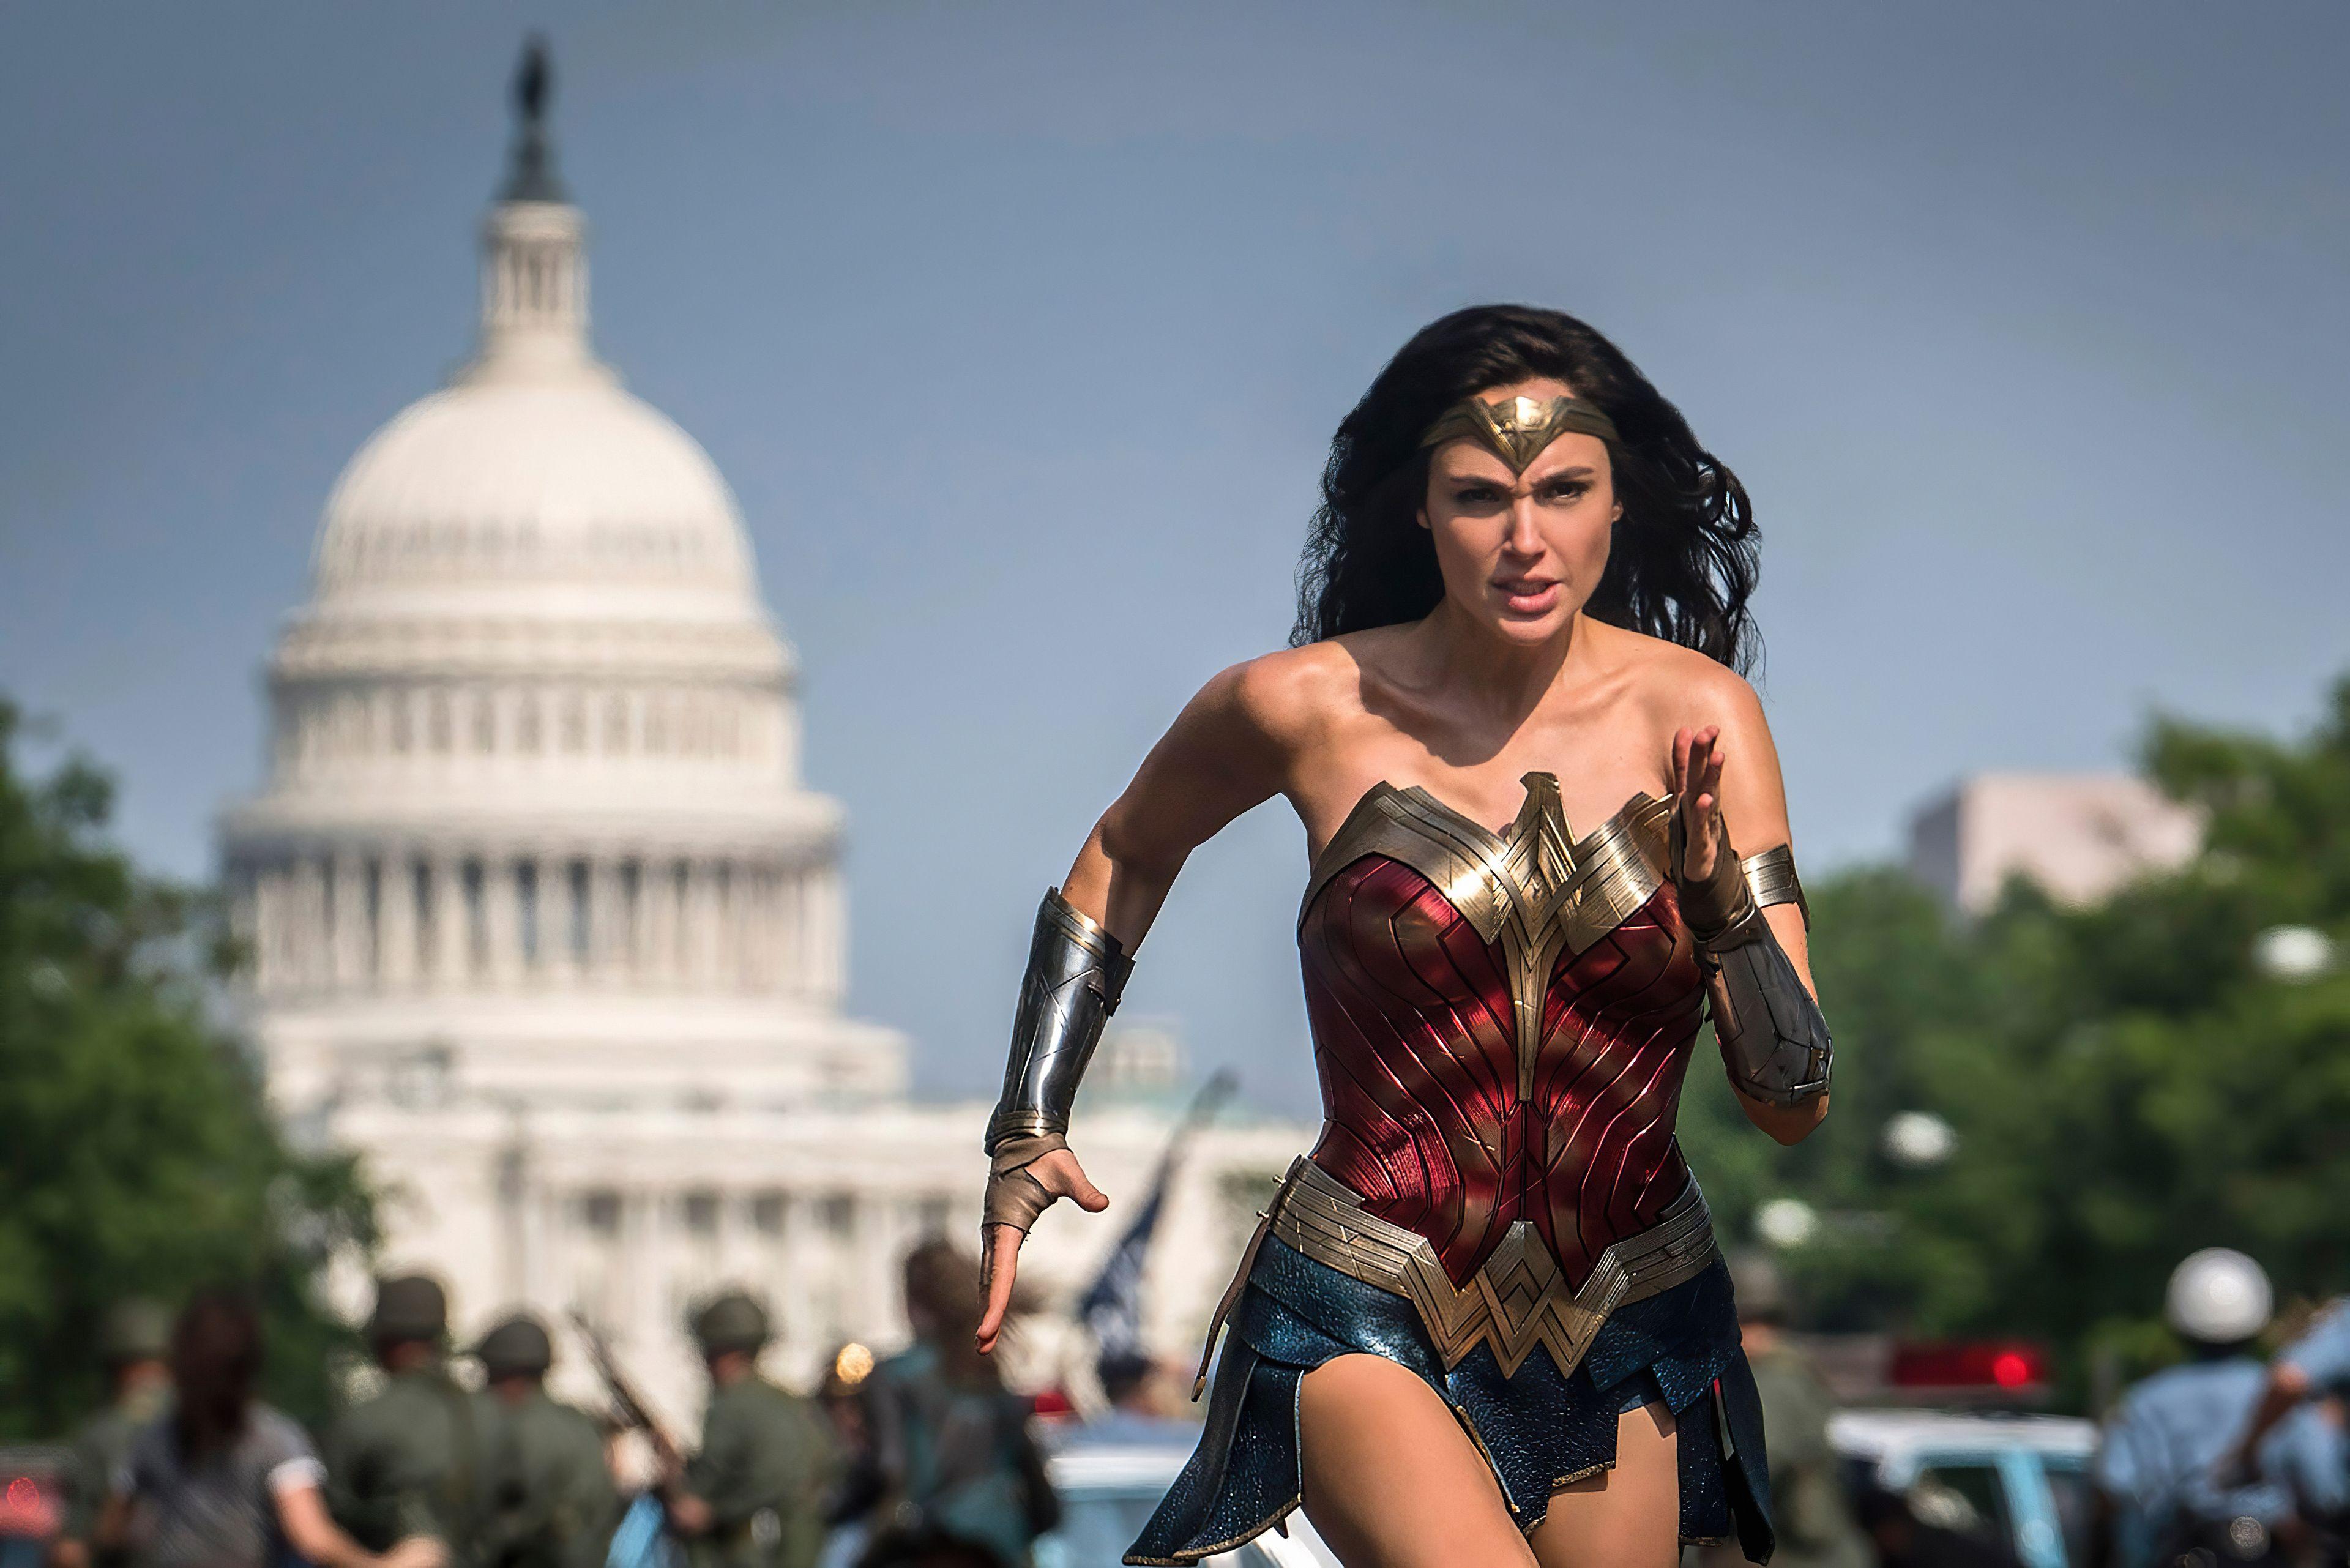 Wonder Woman 1984 2020 Wonder Woman 1984 2020 Wallpapers Wonder Woman 1984 2020 4k Wallpapers In 2020 Wonder Woman Gal Gadot Gal Gadot Wonder Woman